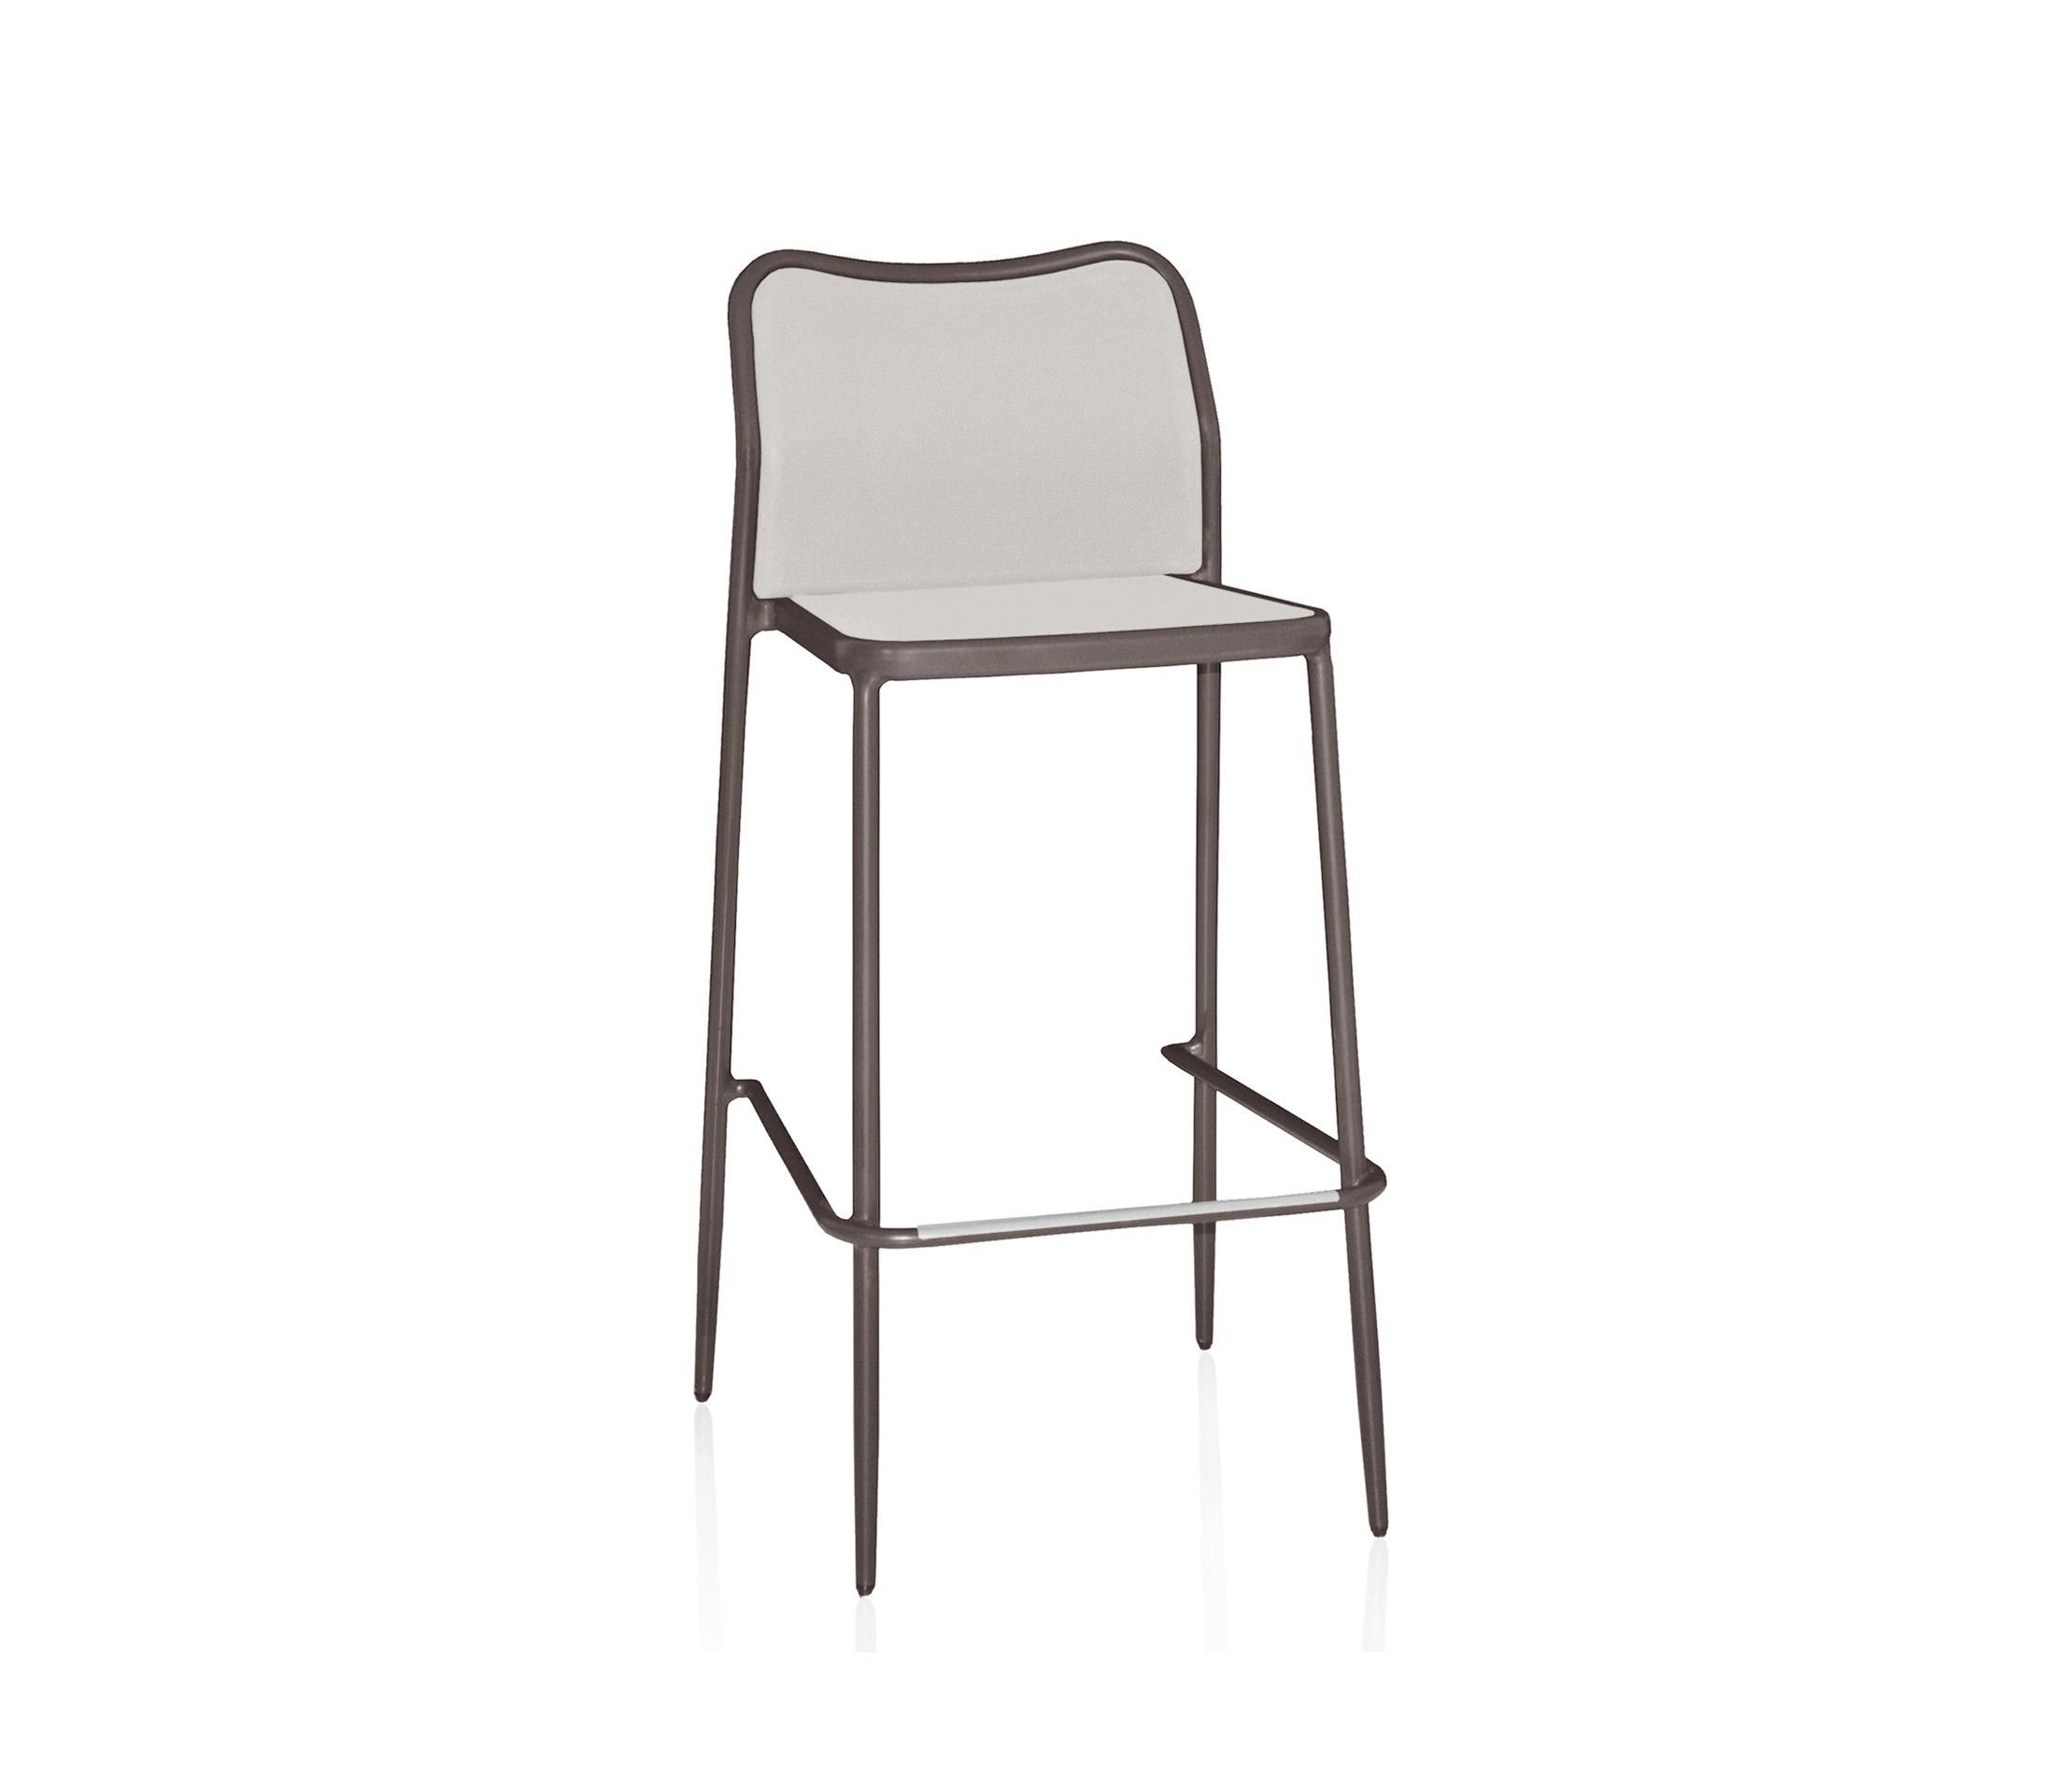 Senso Chairs Tabouret De Expormim | Tabourets De Bar ...